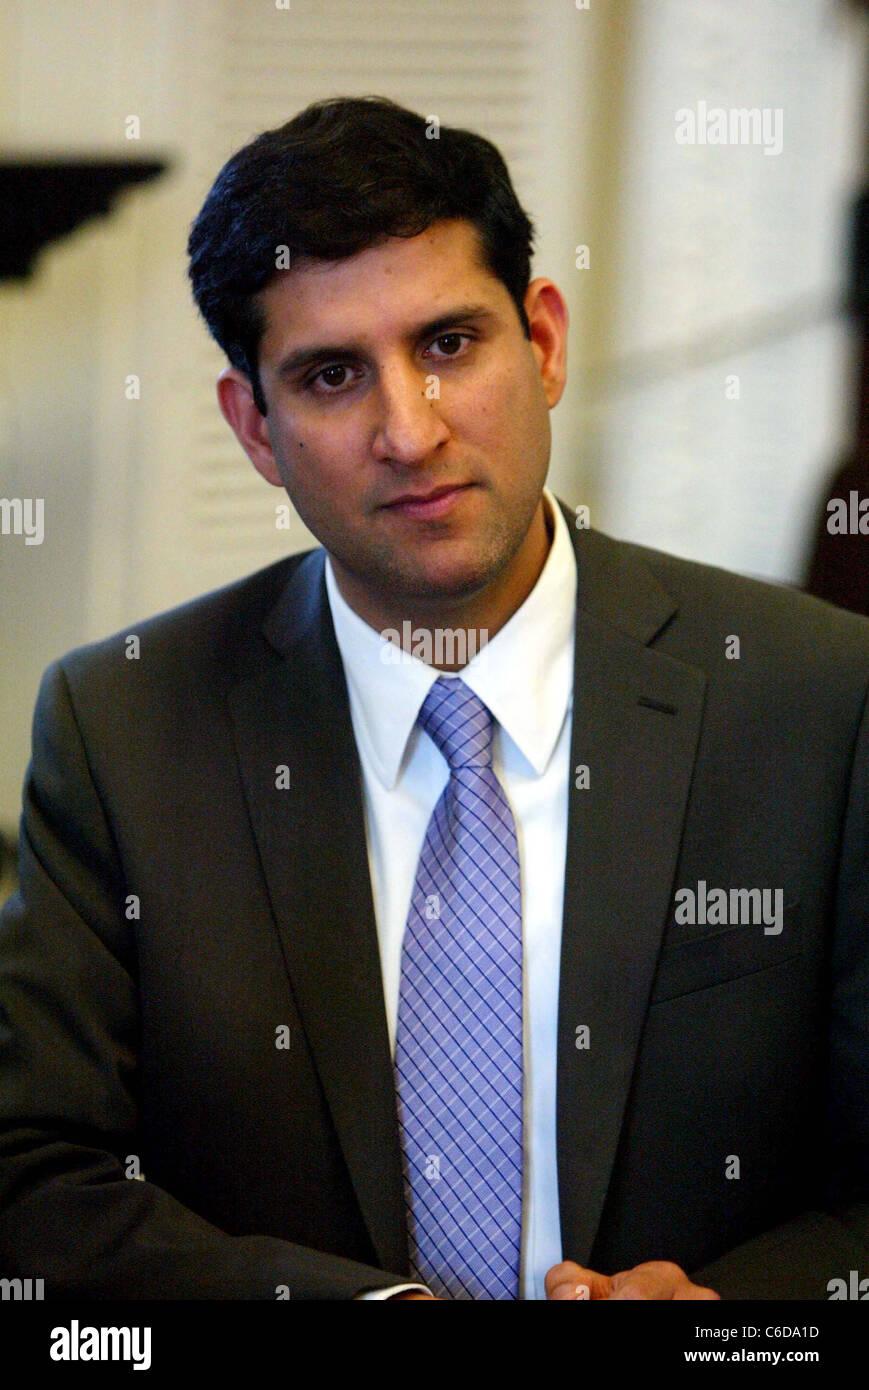 Outcome Health Loses Operating Chief Vivek Kundra - WSJ